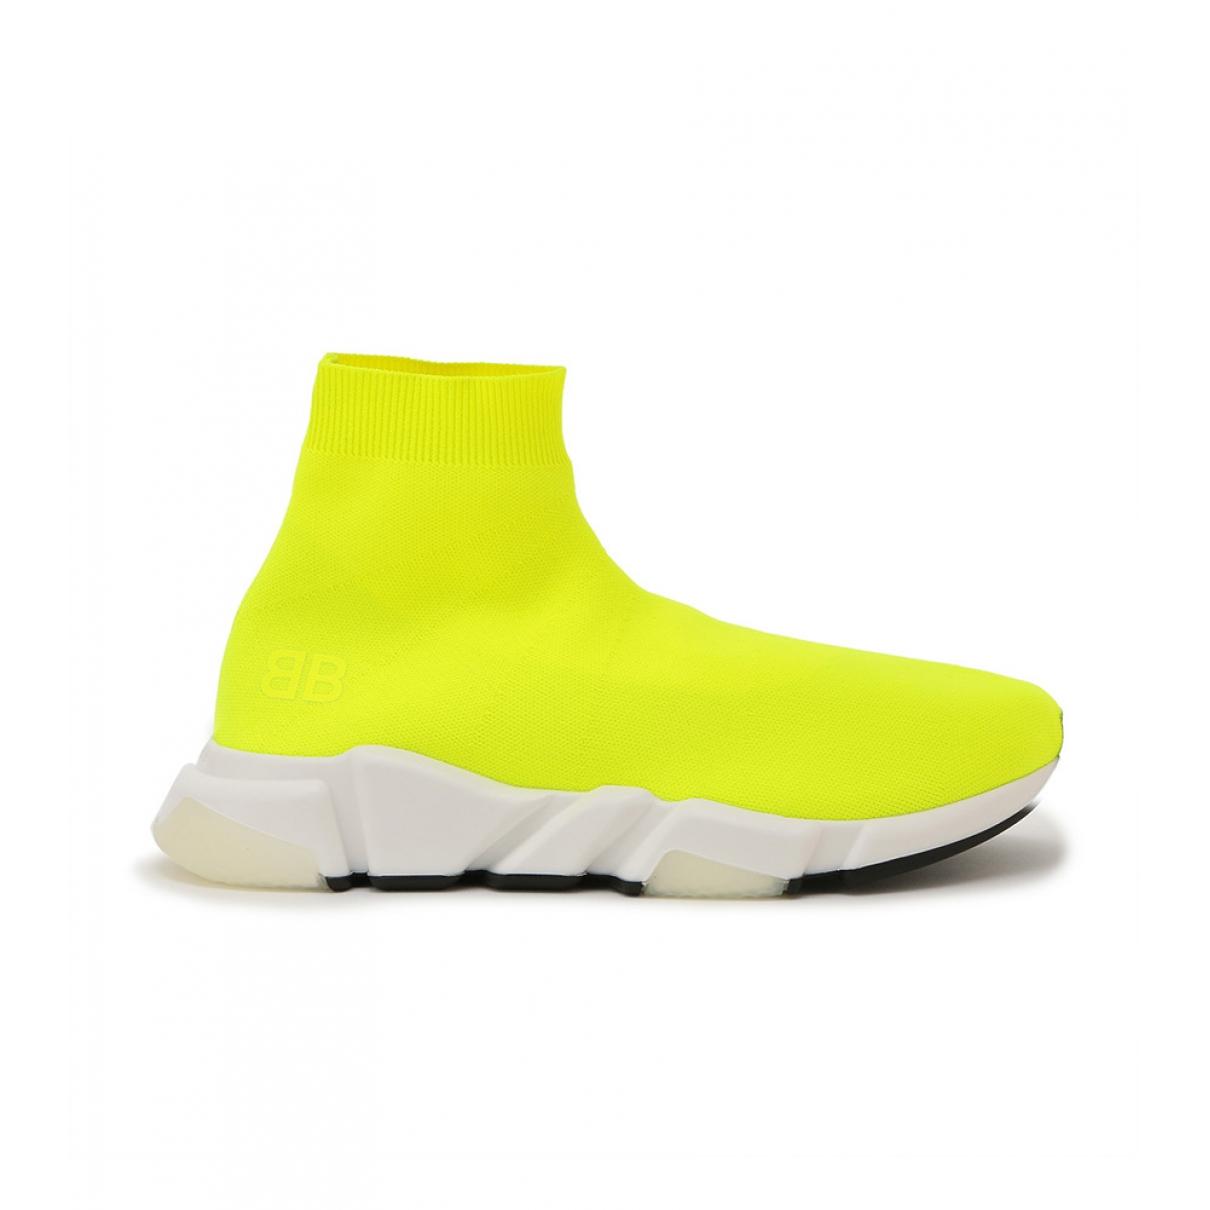 Balenciaga Speed Yellow Cloth Trainers for Men 40 EU